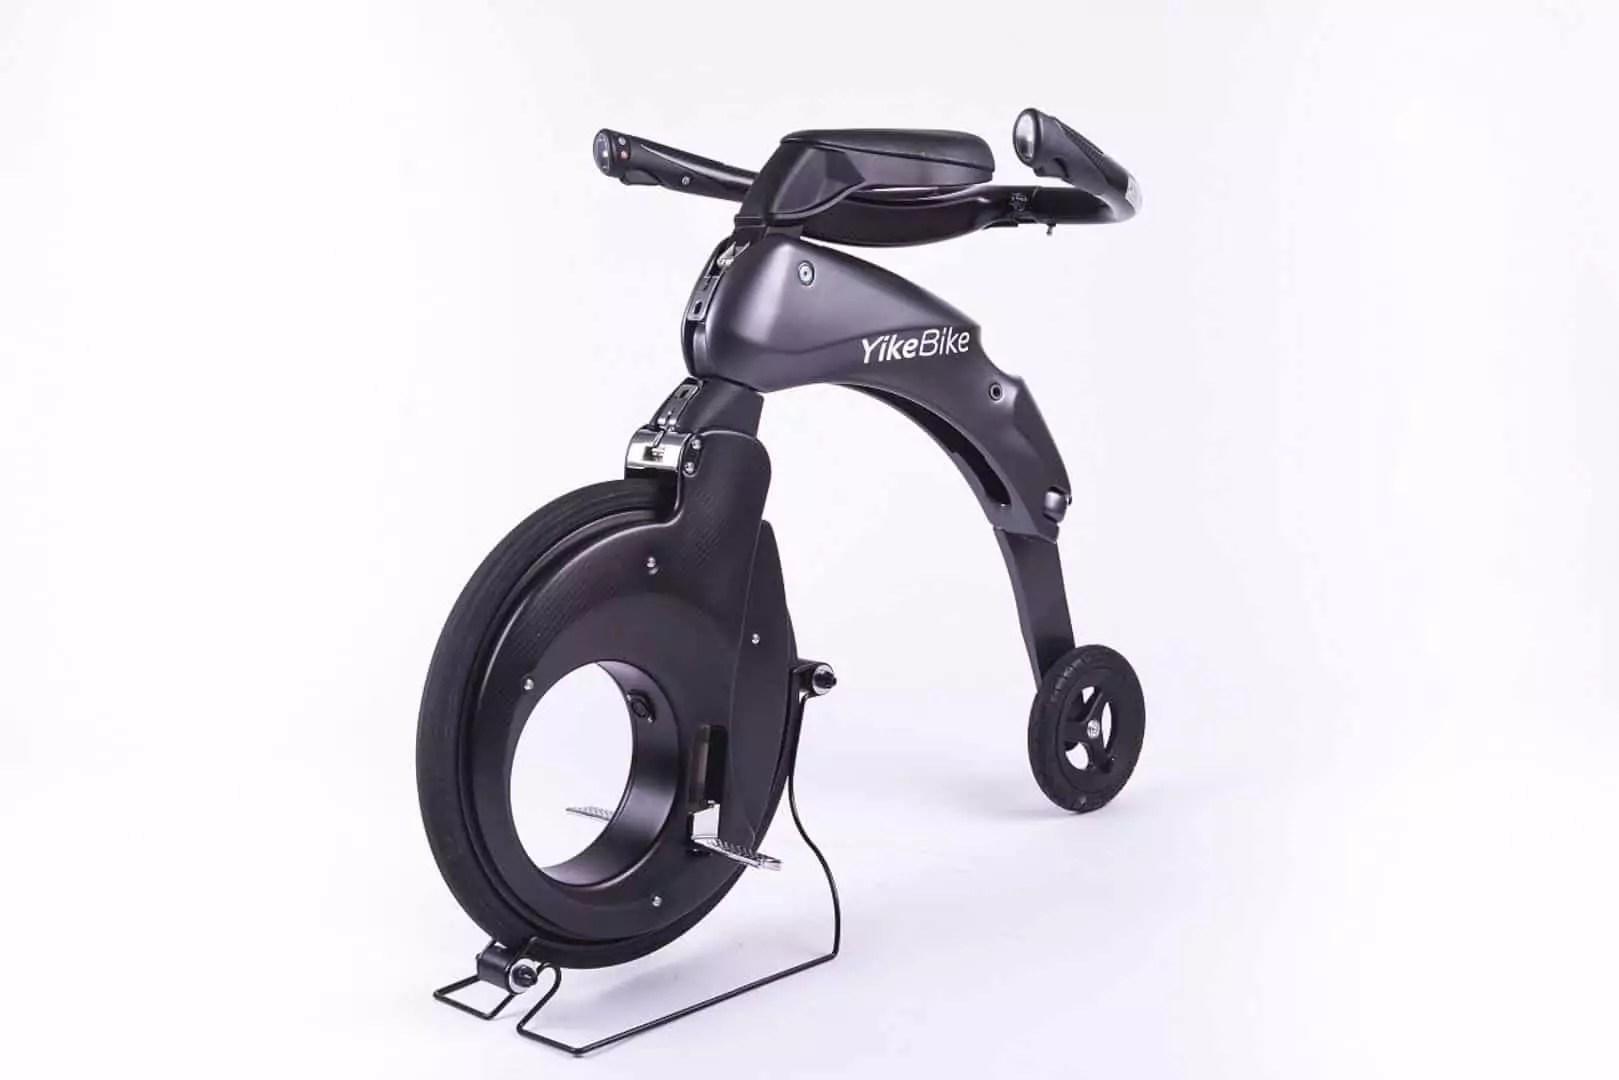 YikeBike - The Award Winning Fully Electric Folding Bike